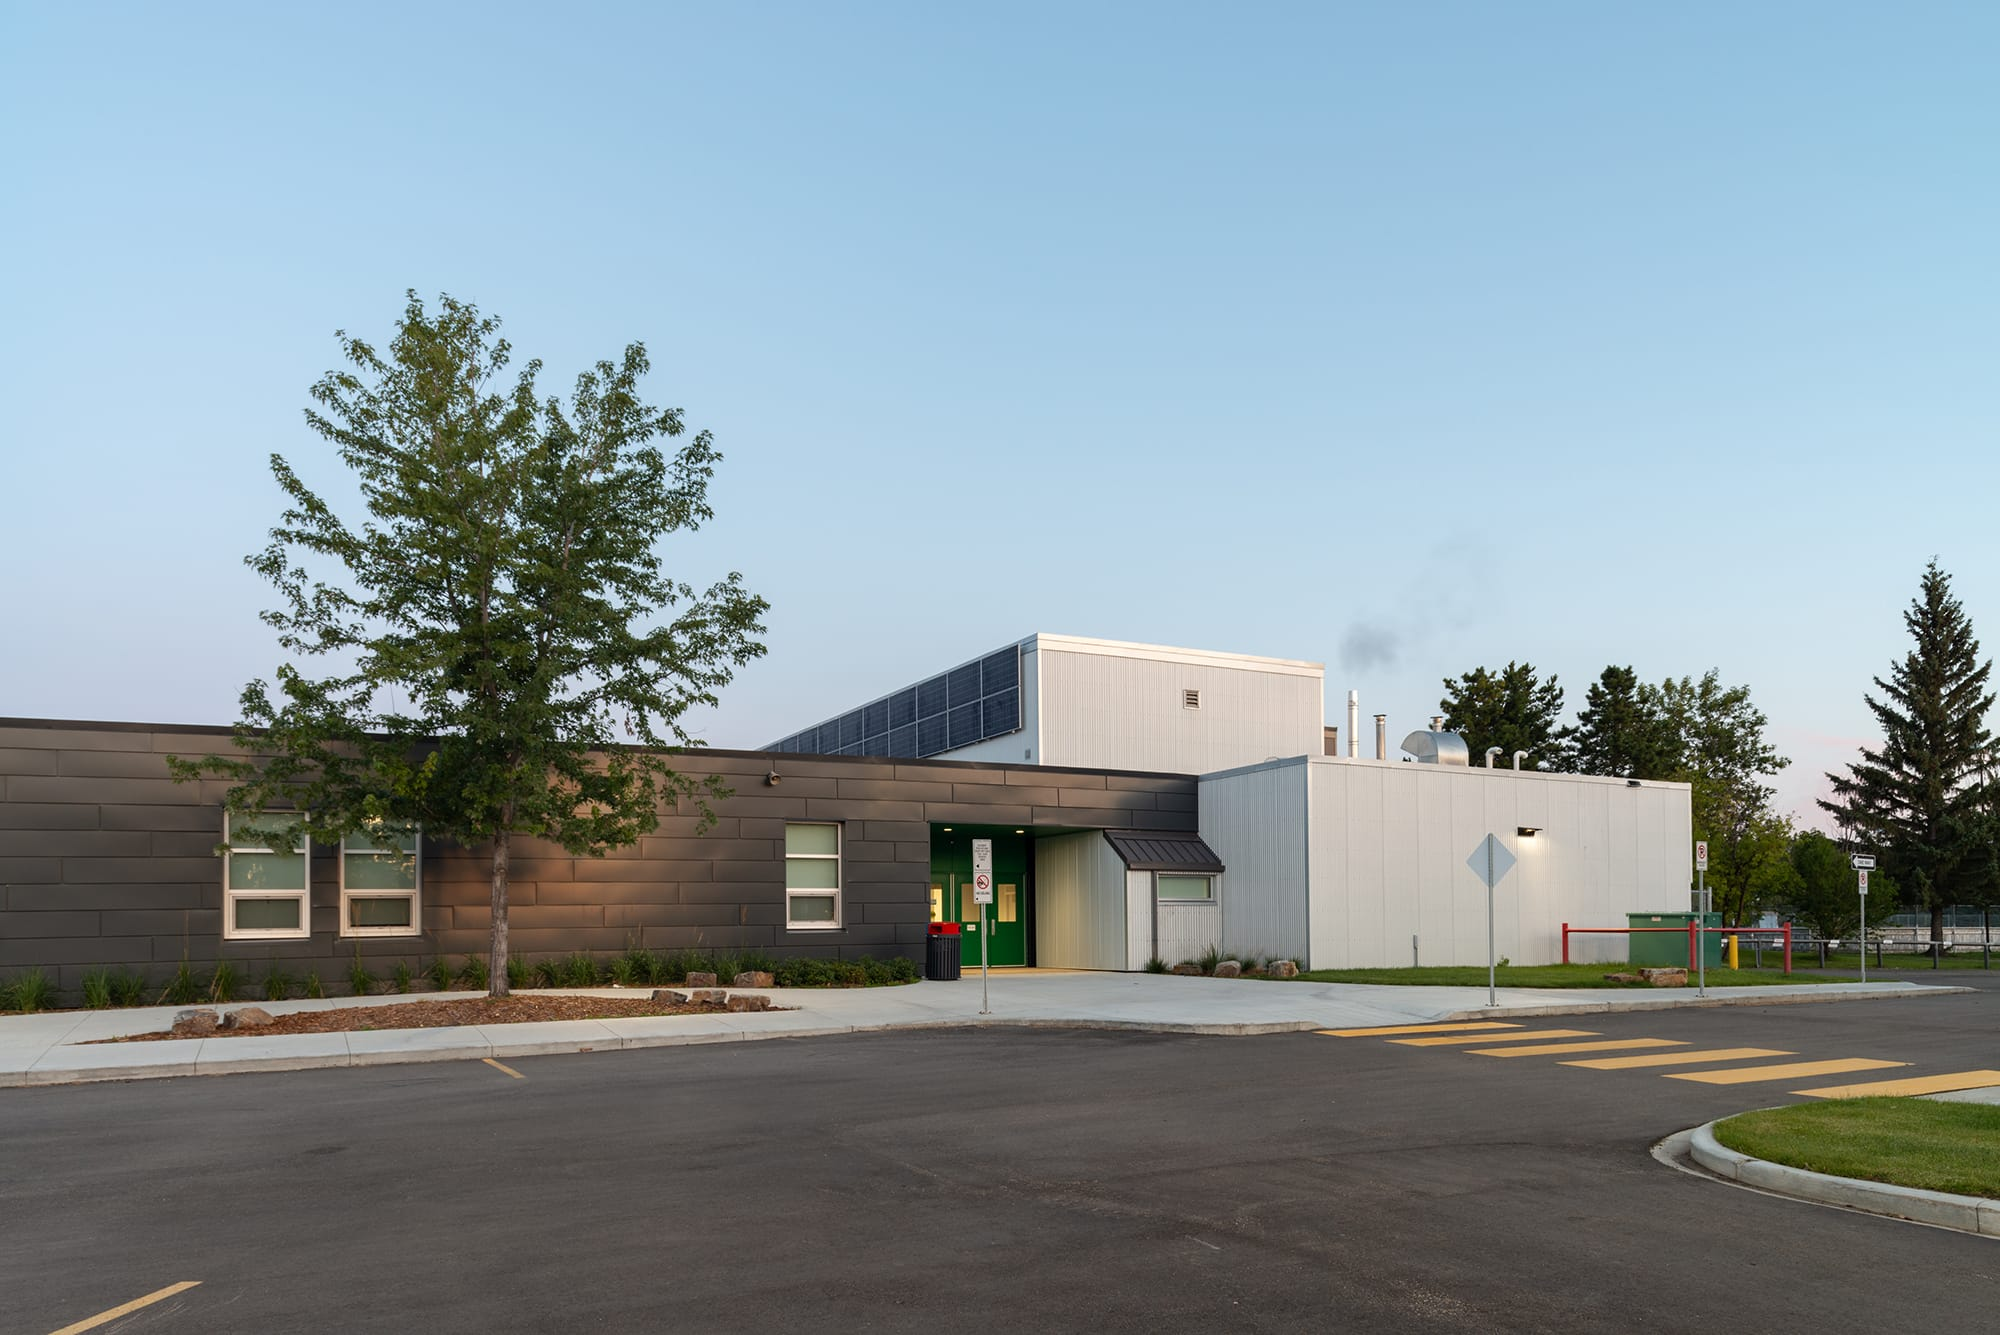 Caernarvon Elementary School exterior entrance